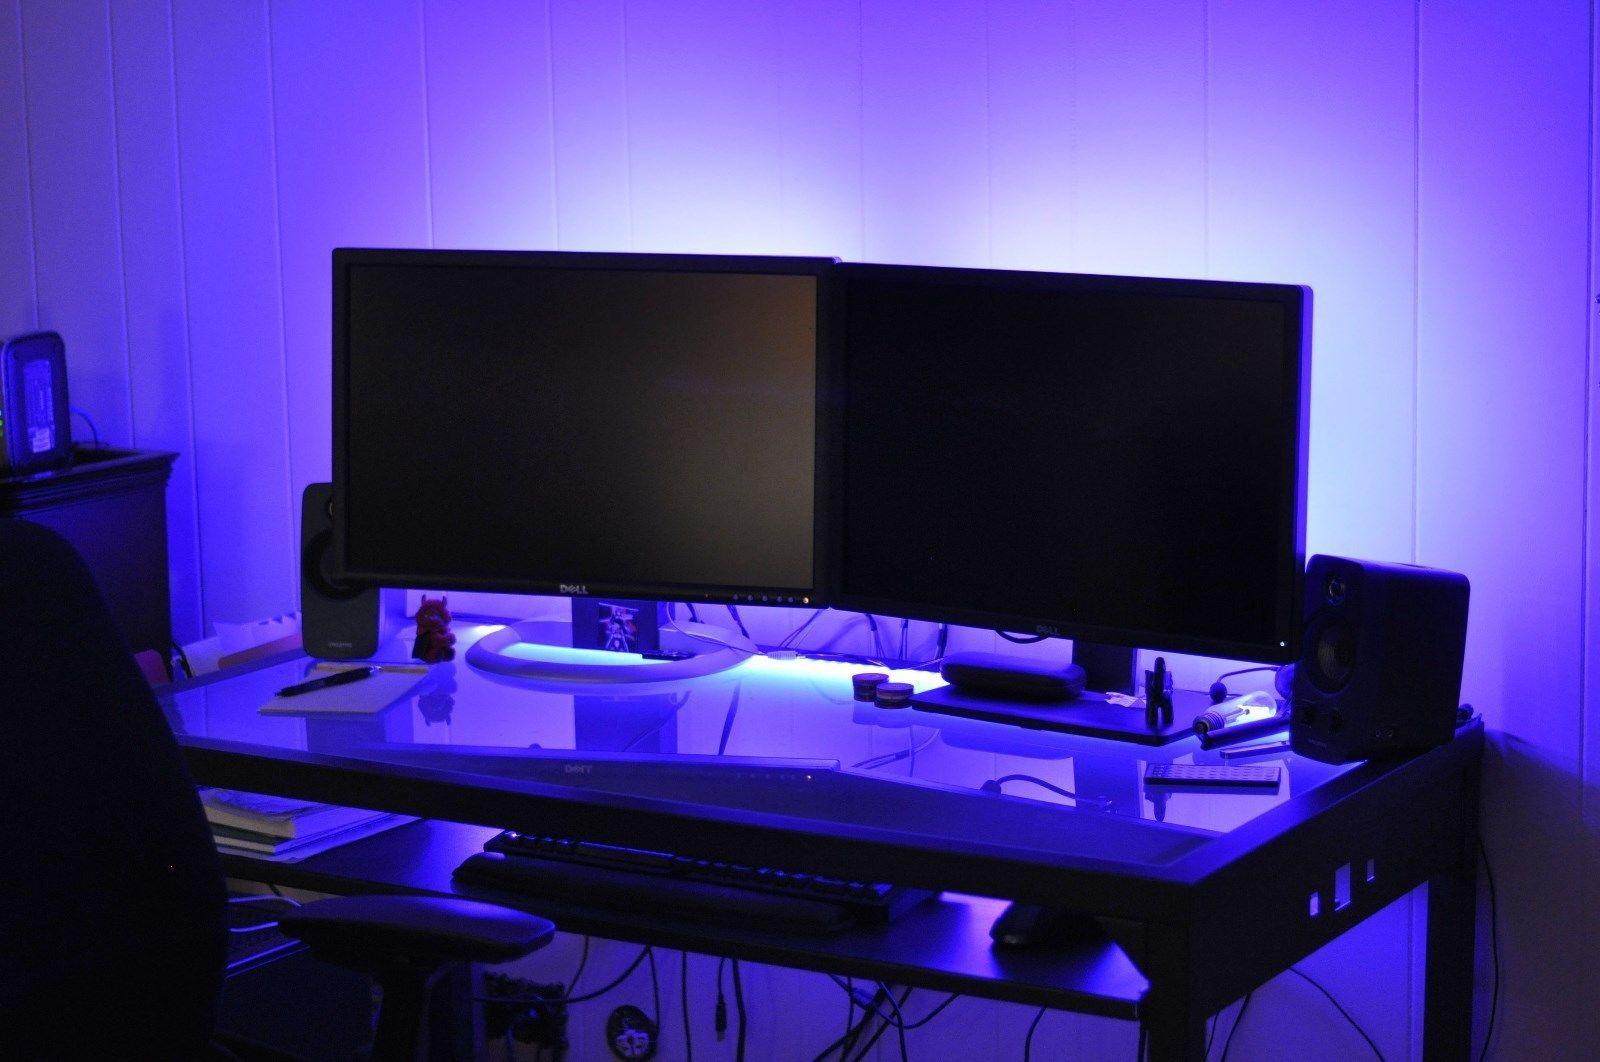 Gaming LED lights _______ Gamer Desk Lights great Christmas GIFT 2015 Christmas